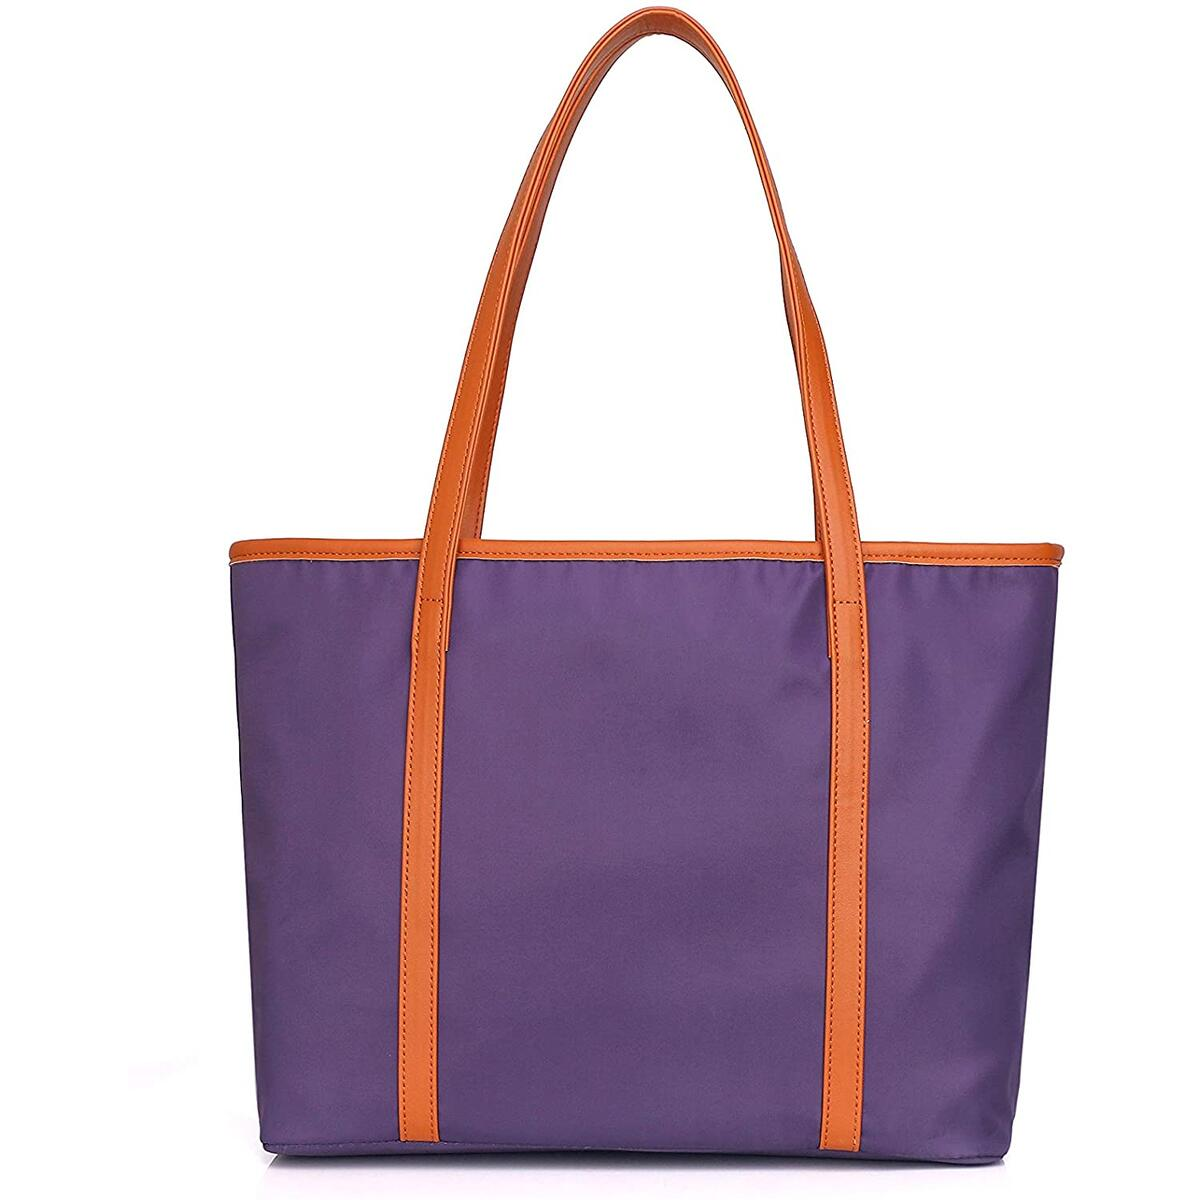 Women's Luxury Purse and Handbags Ladies Shoulder Bag Designer Satchel Messenger Patent Leather Crossbody Tote Bags (Parent)